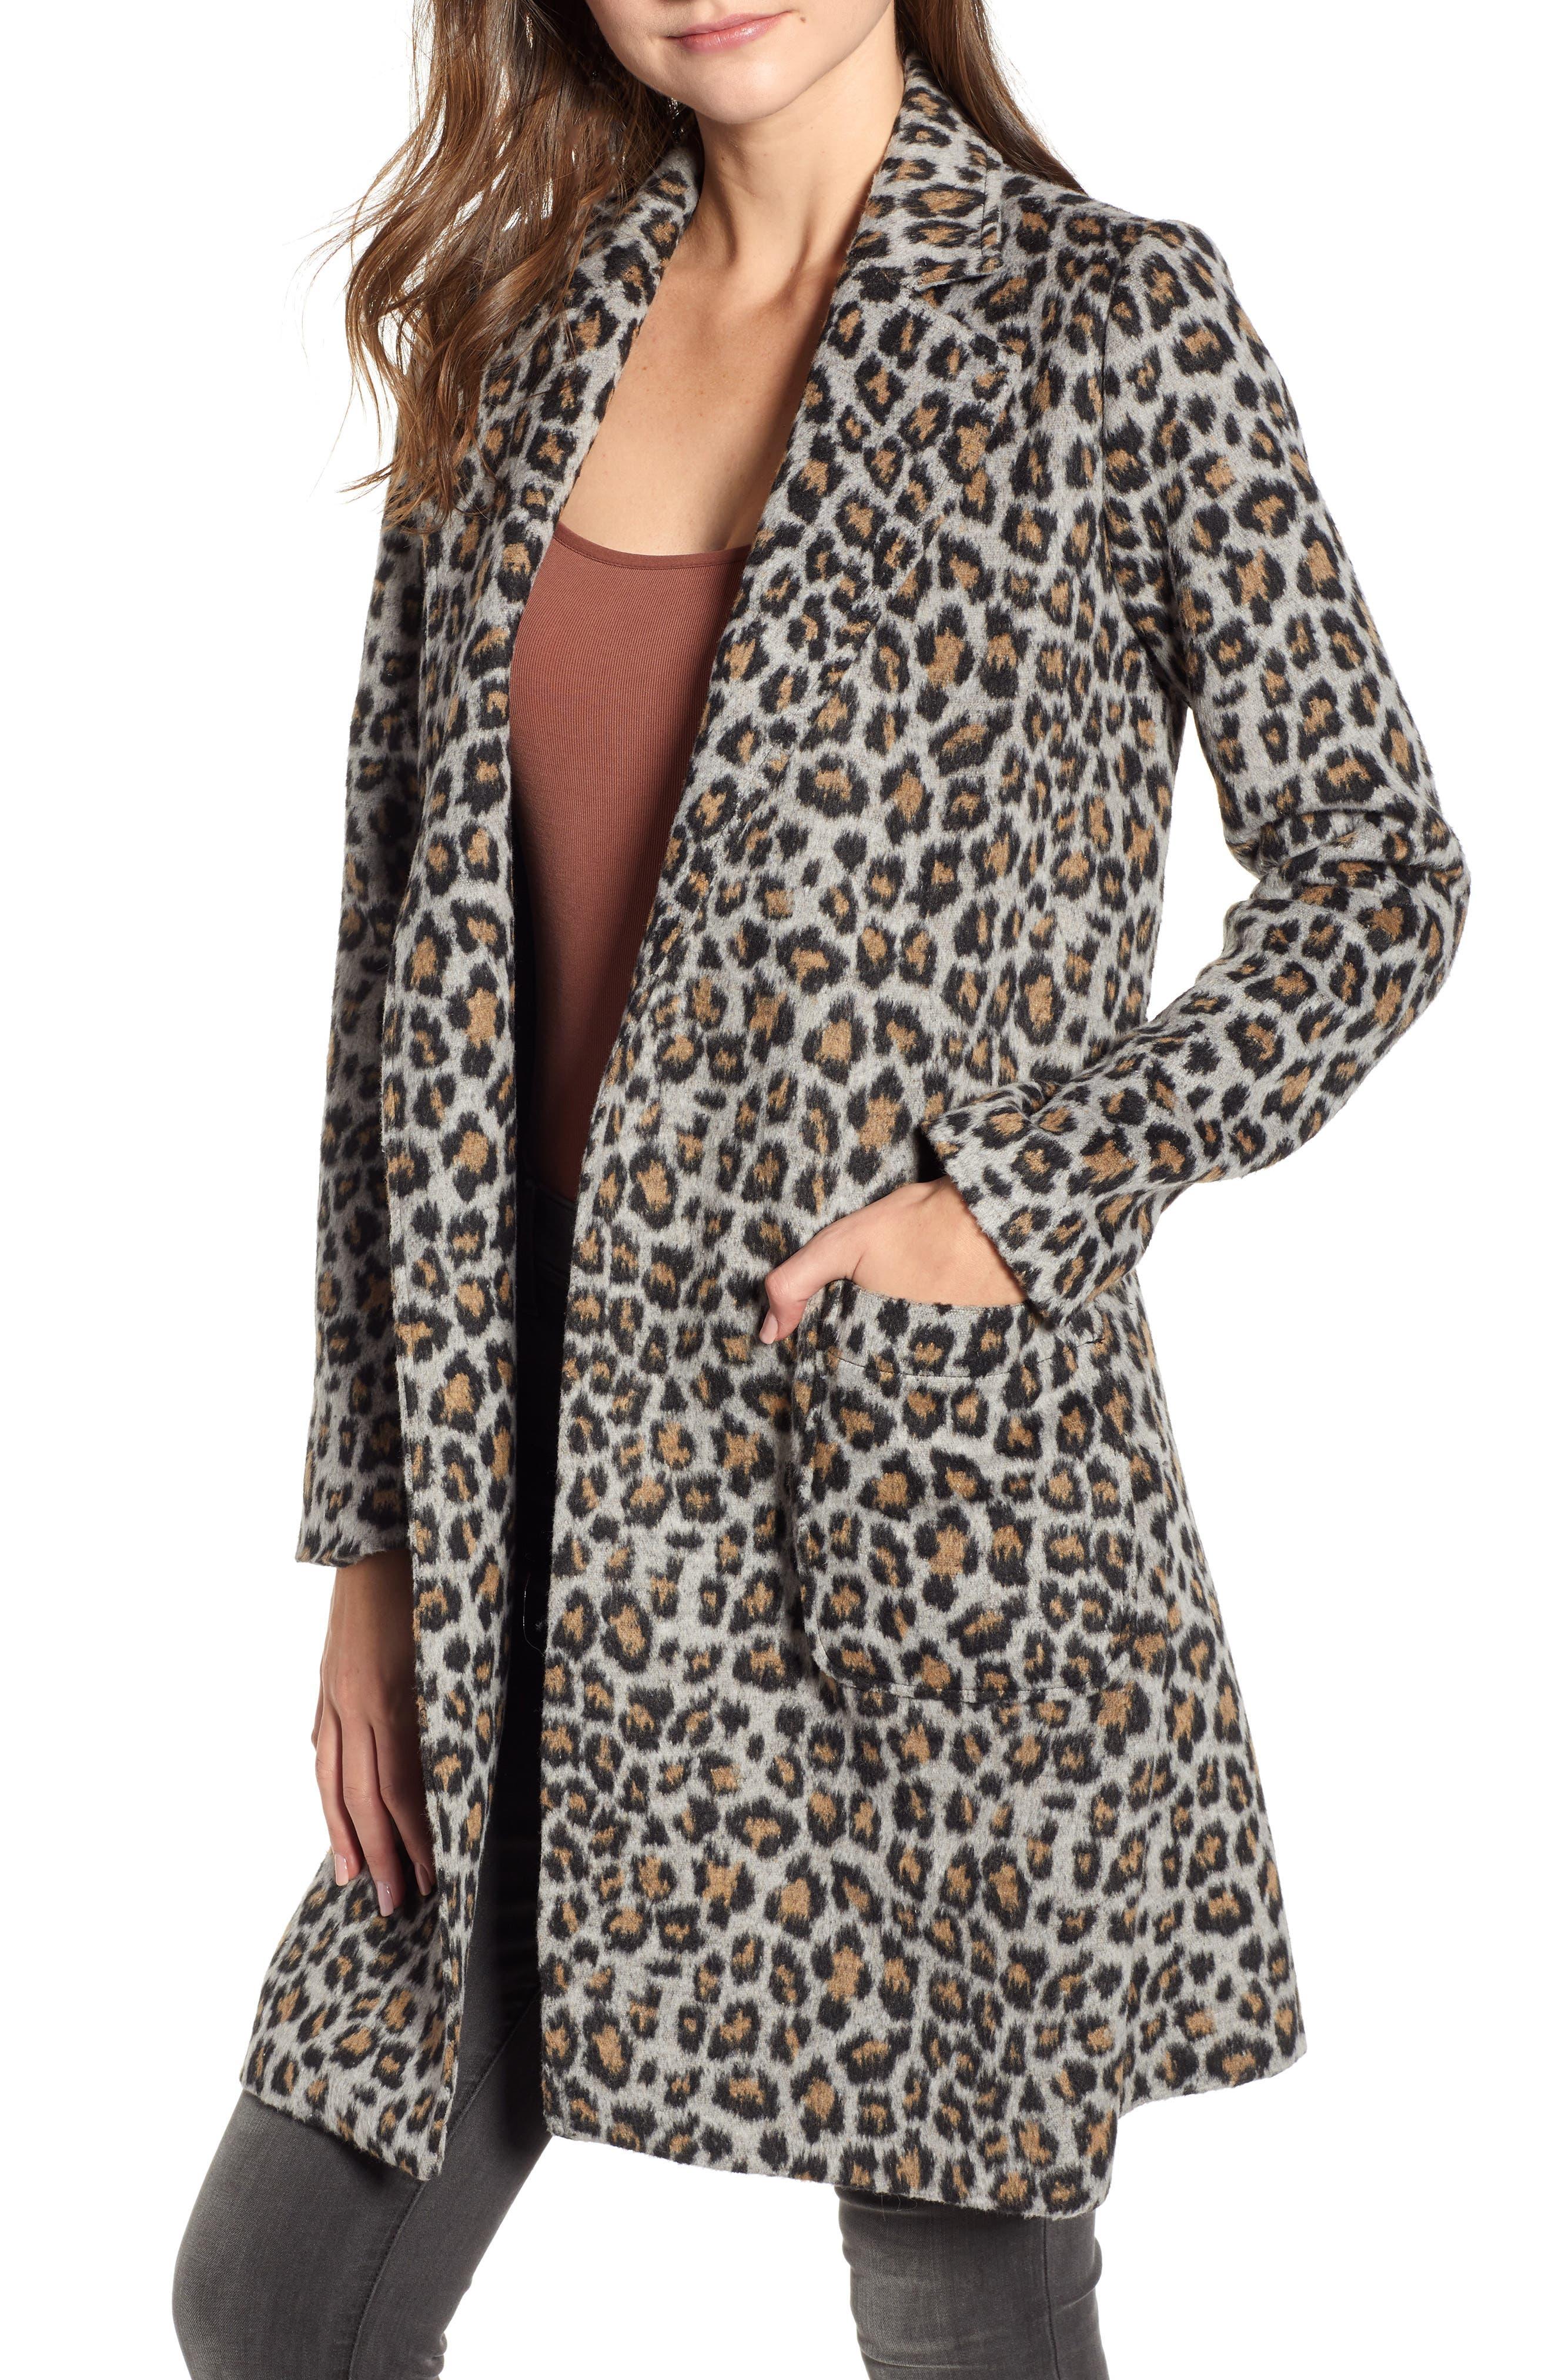 Sale alerts for  Leopard Belted Trench Coat - Covvet